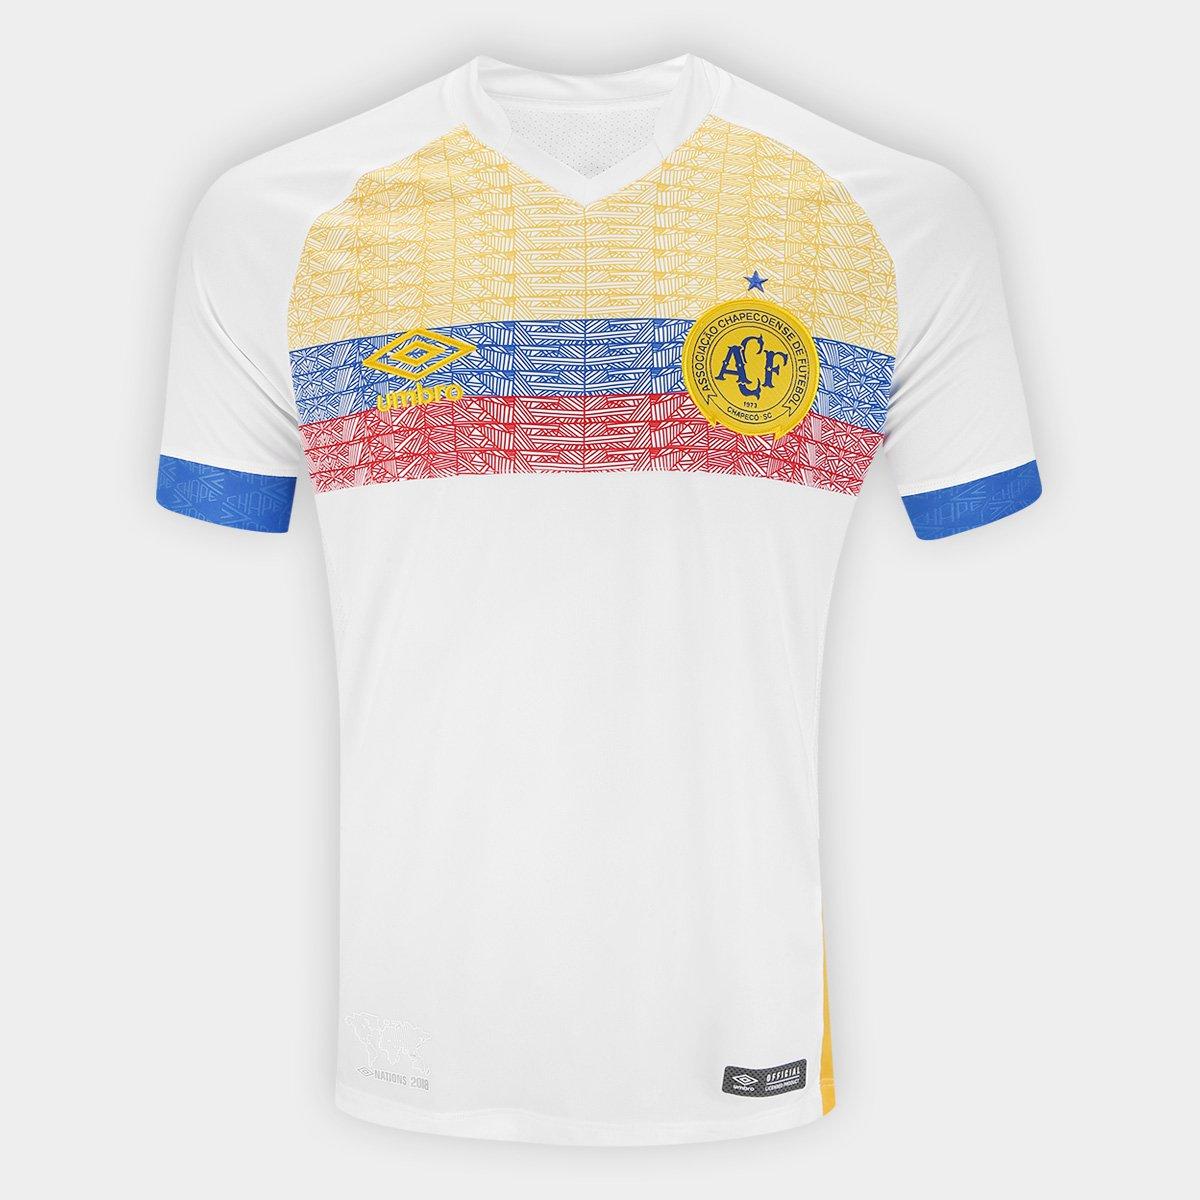 Camisa Chapecoense II 2018 s/n° La Pasion Torcedor Umbro Masculina - Branco e Azul